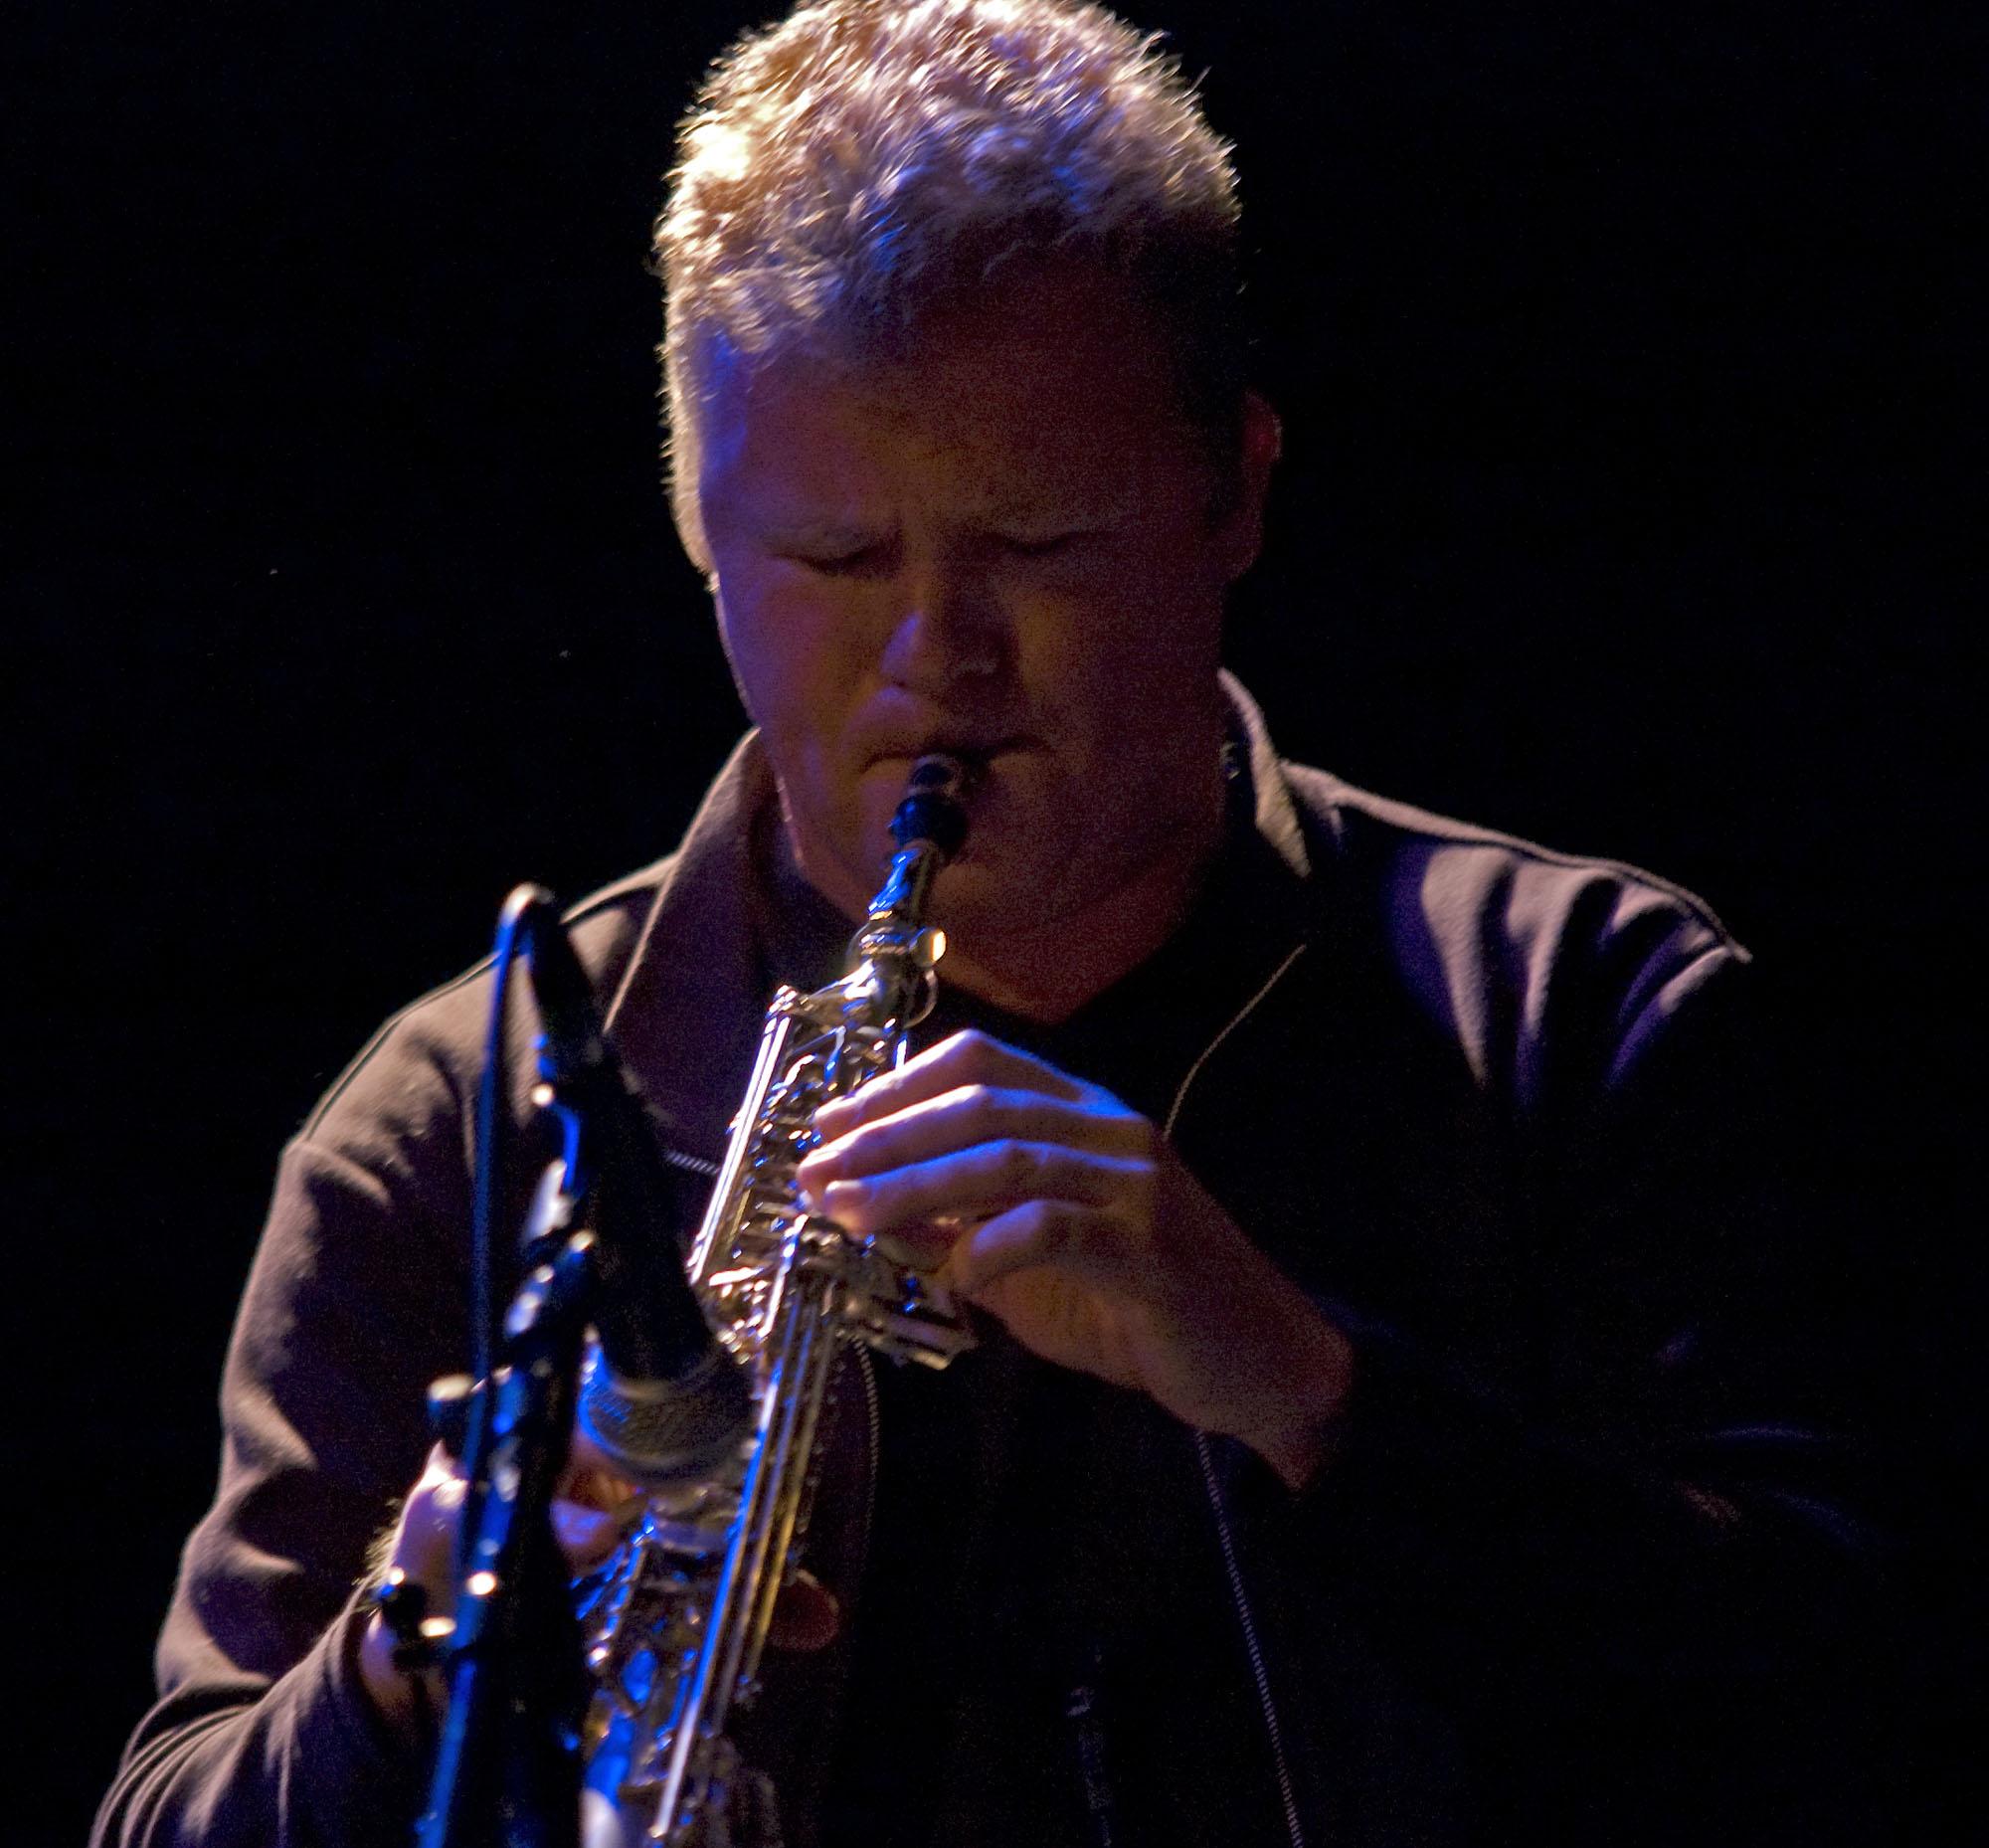 Iain Ballamy, Performing with Food at Enjoy Jazz 2010